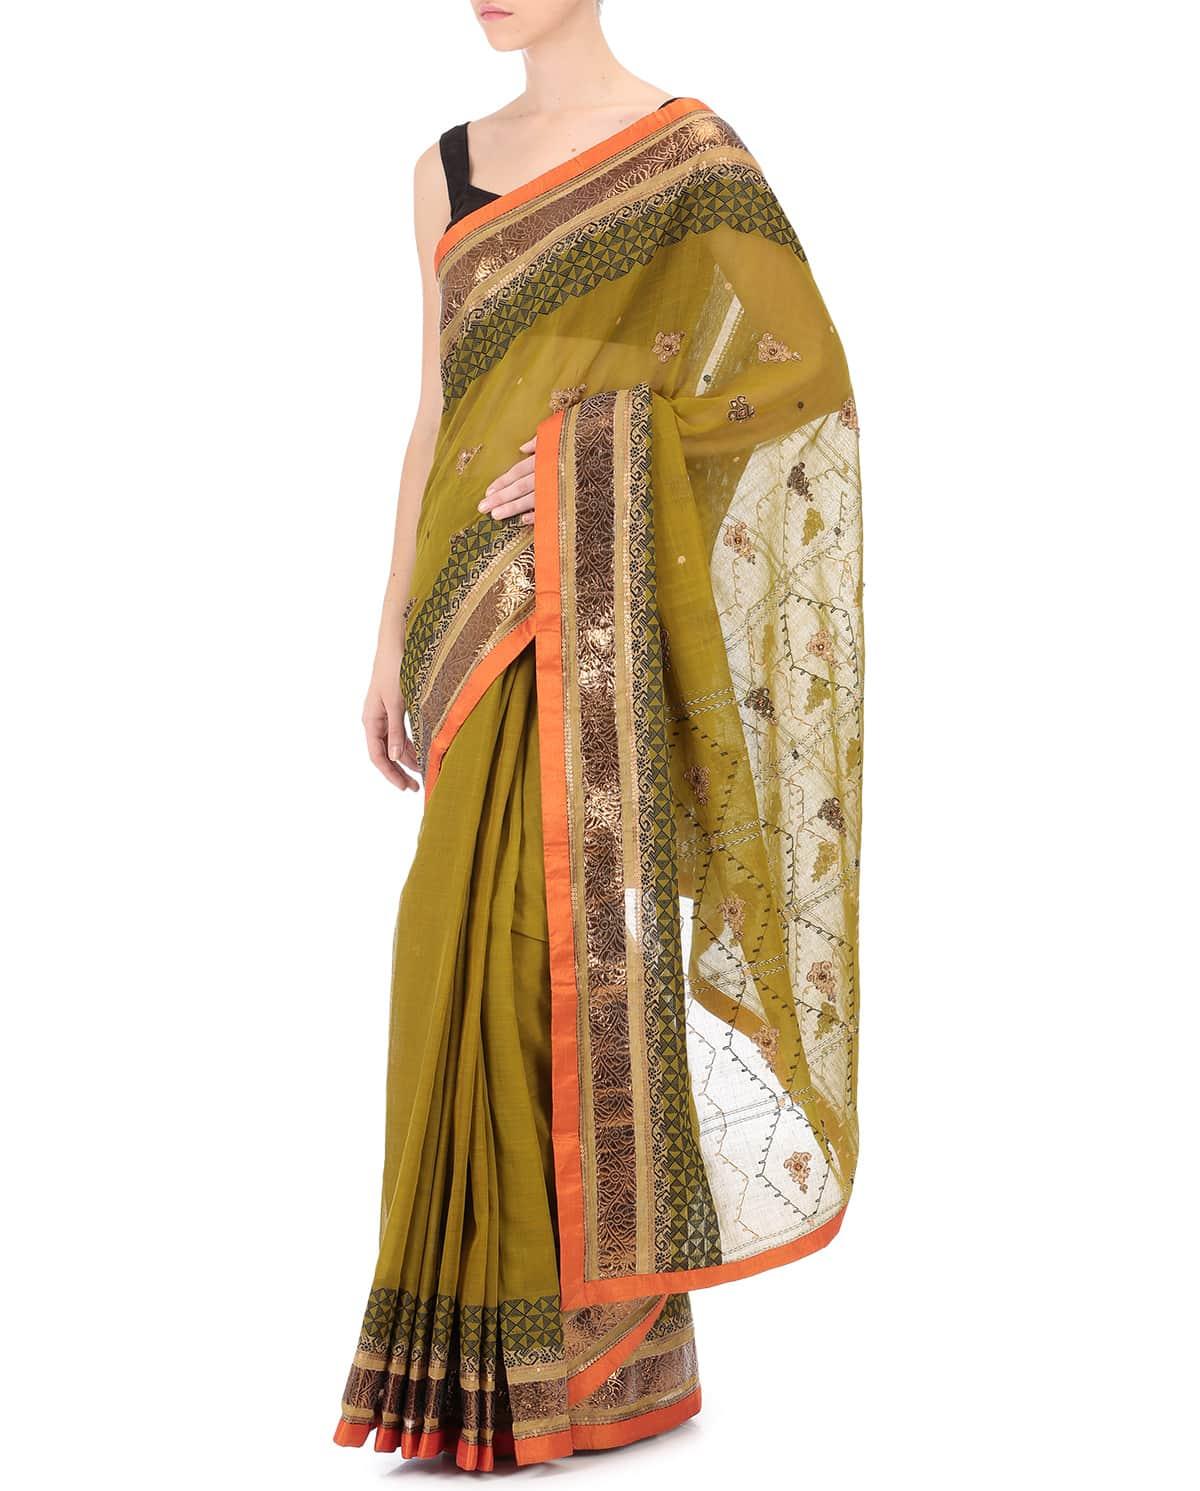 Handwoven Cotton Silk Sari wit Blouse